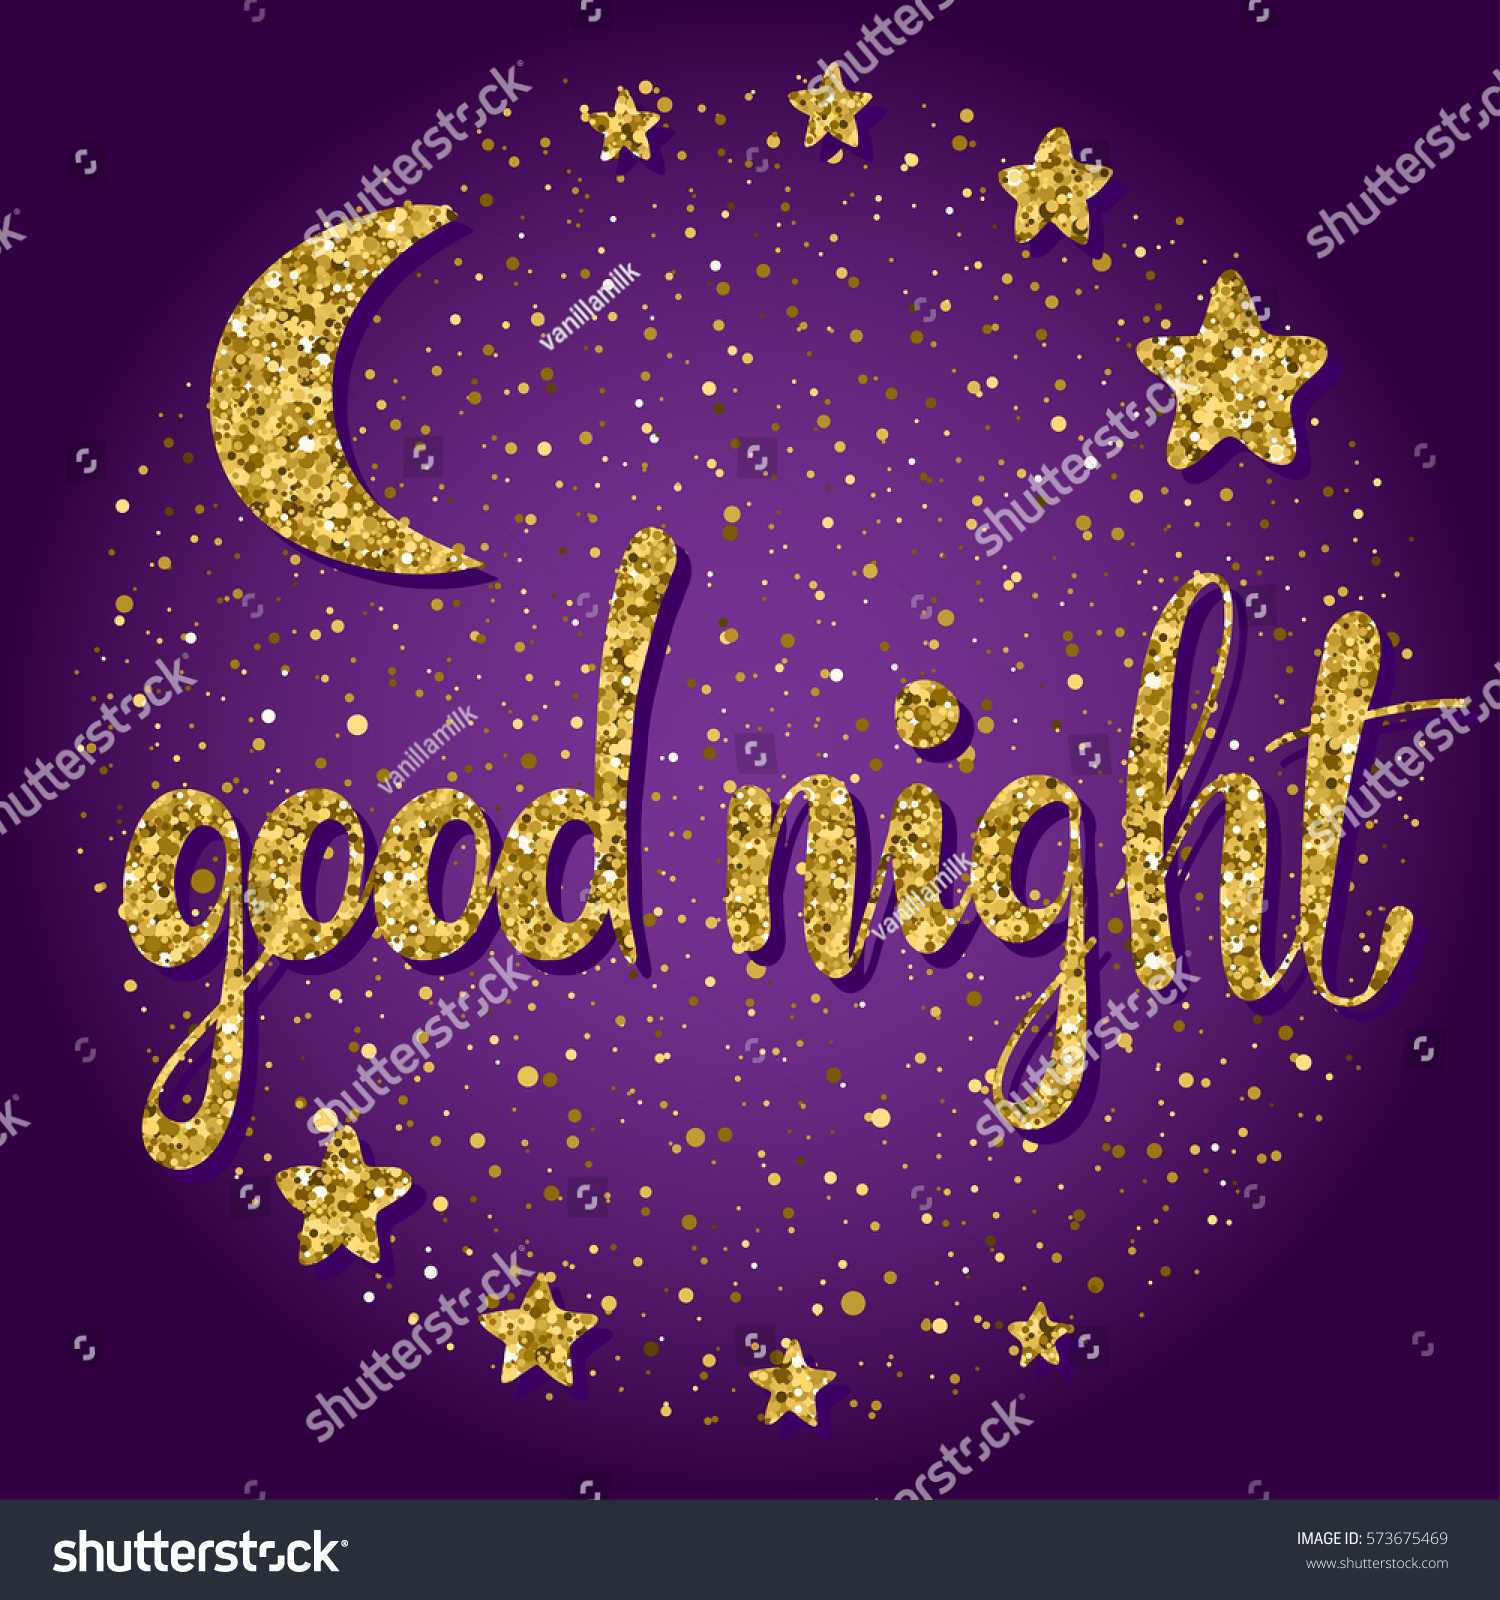 Royalty Free Stock Illustration Of Good Night Sweet Dreams Theme